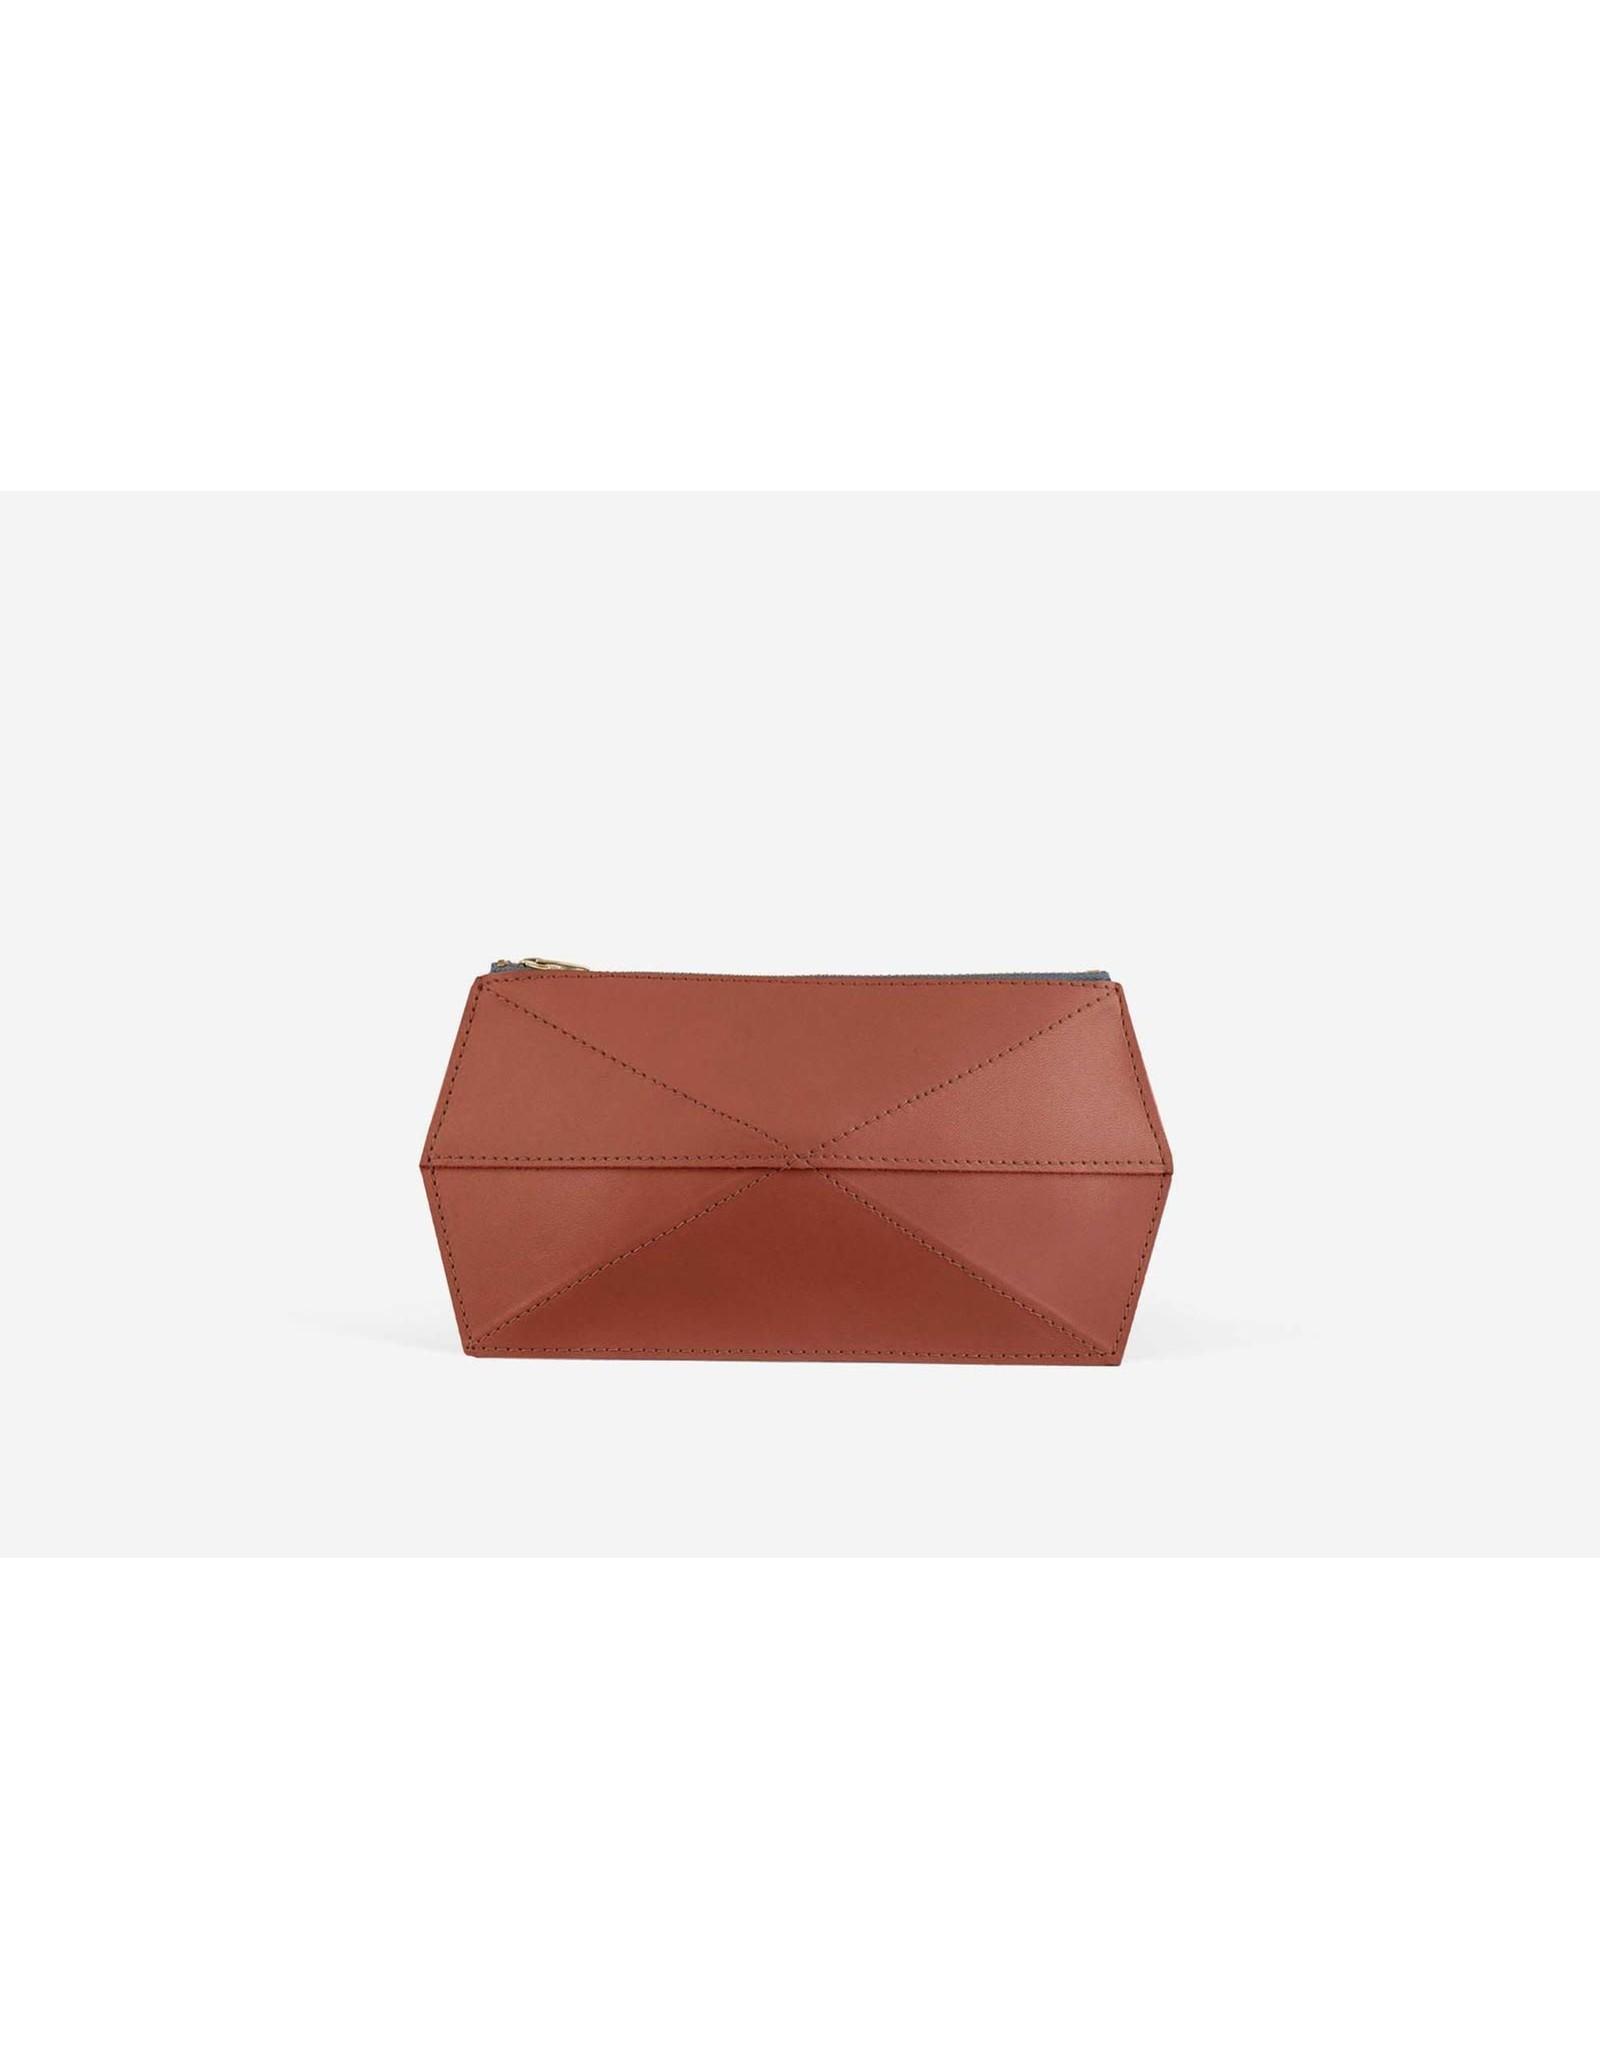 Zand-erover portemonee 3D case | Mini Fold | Terracotta